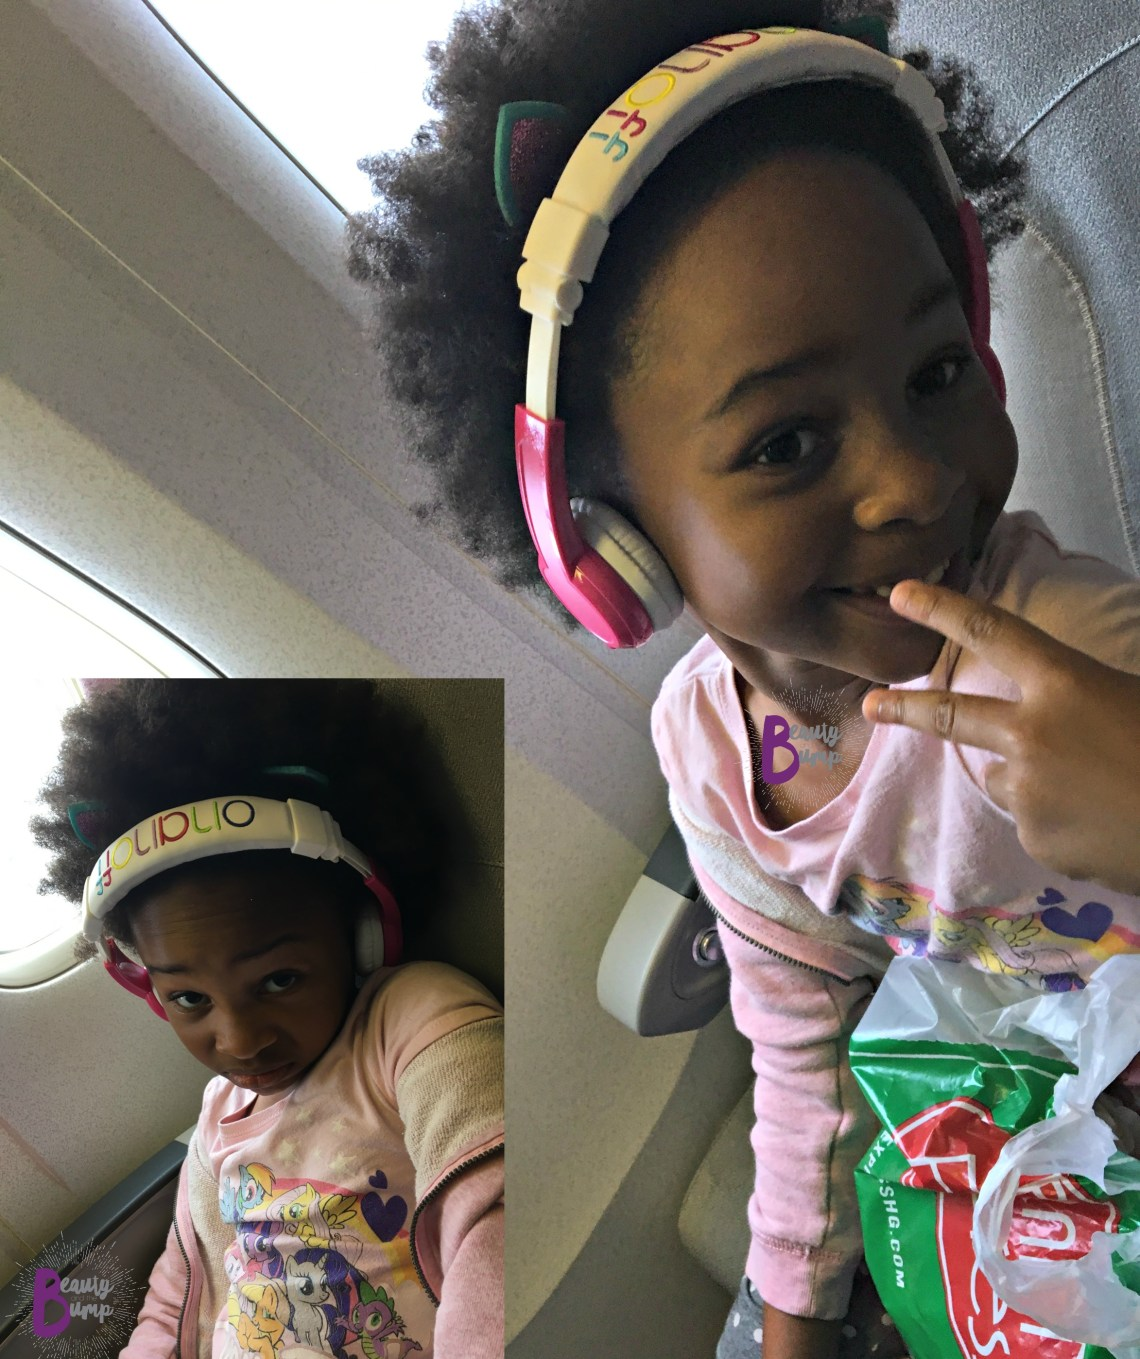 Buddyphones inflight long haul travel kids2